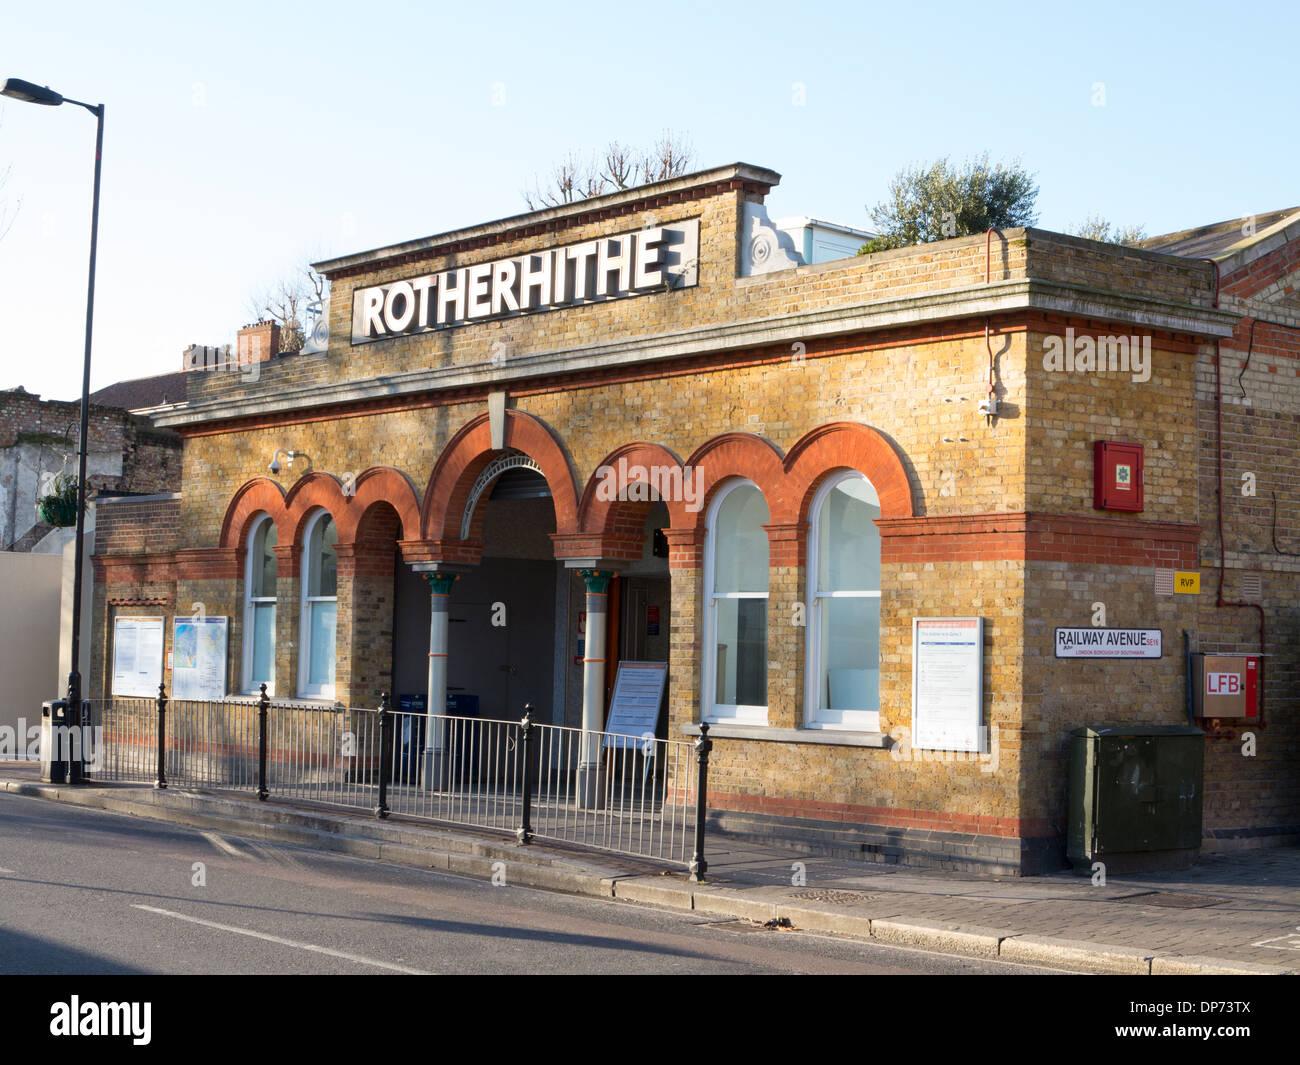 Rotherhite Overground railway station - Stock Image